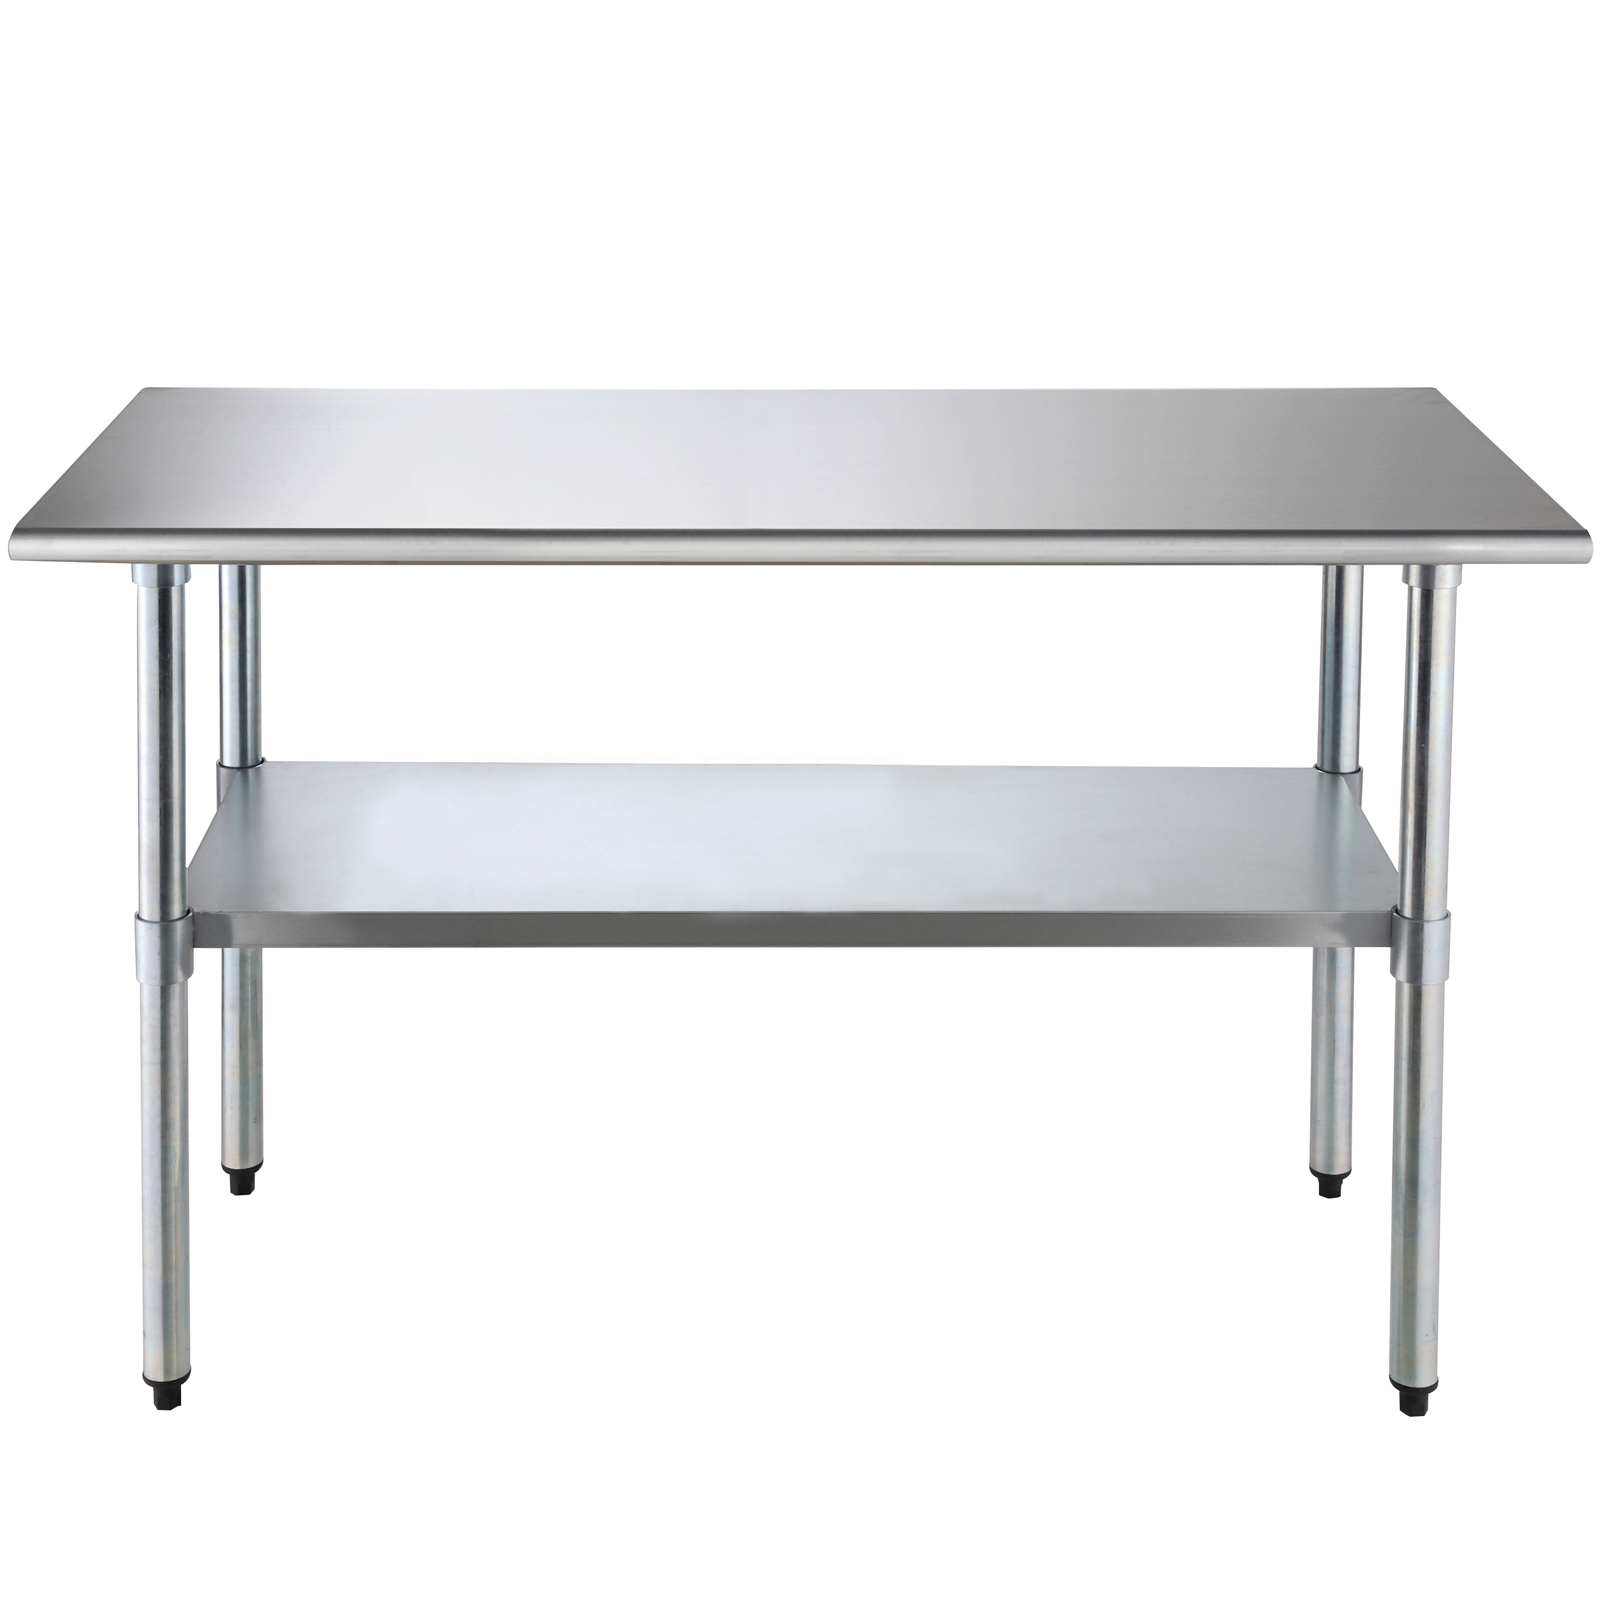 2ft 215 5ft Commercial Stainless Steel Work Prep Table